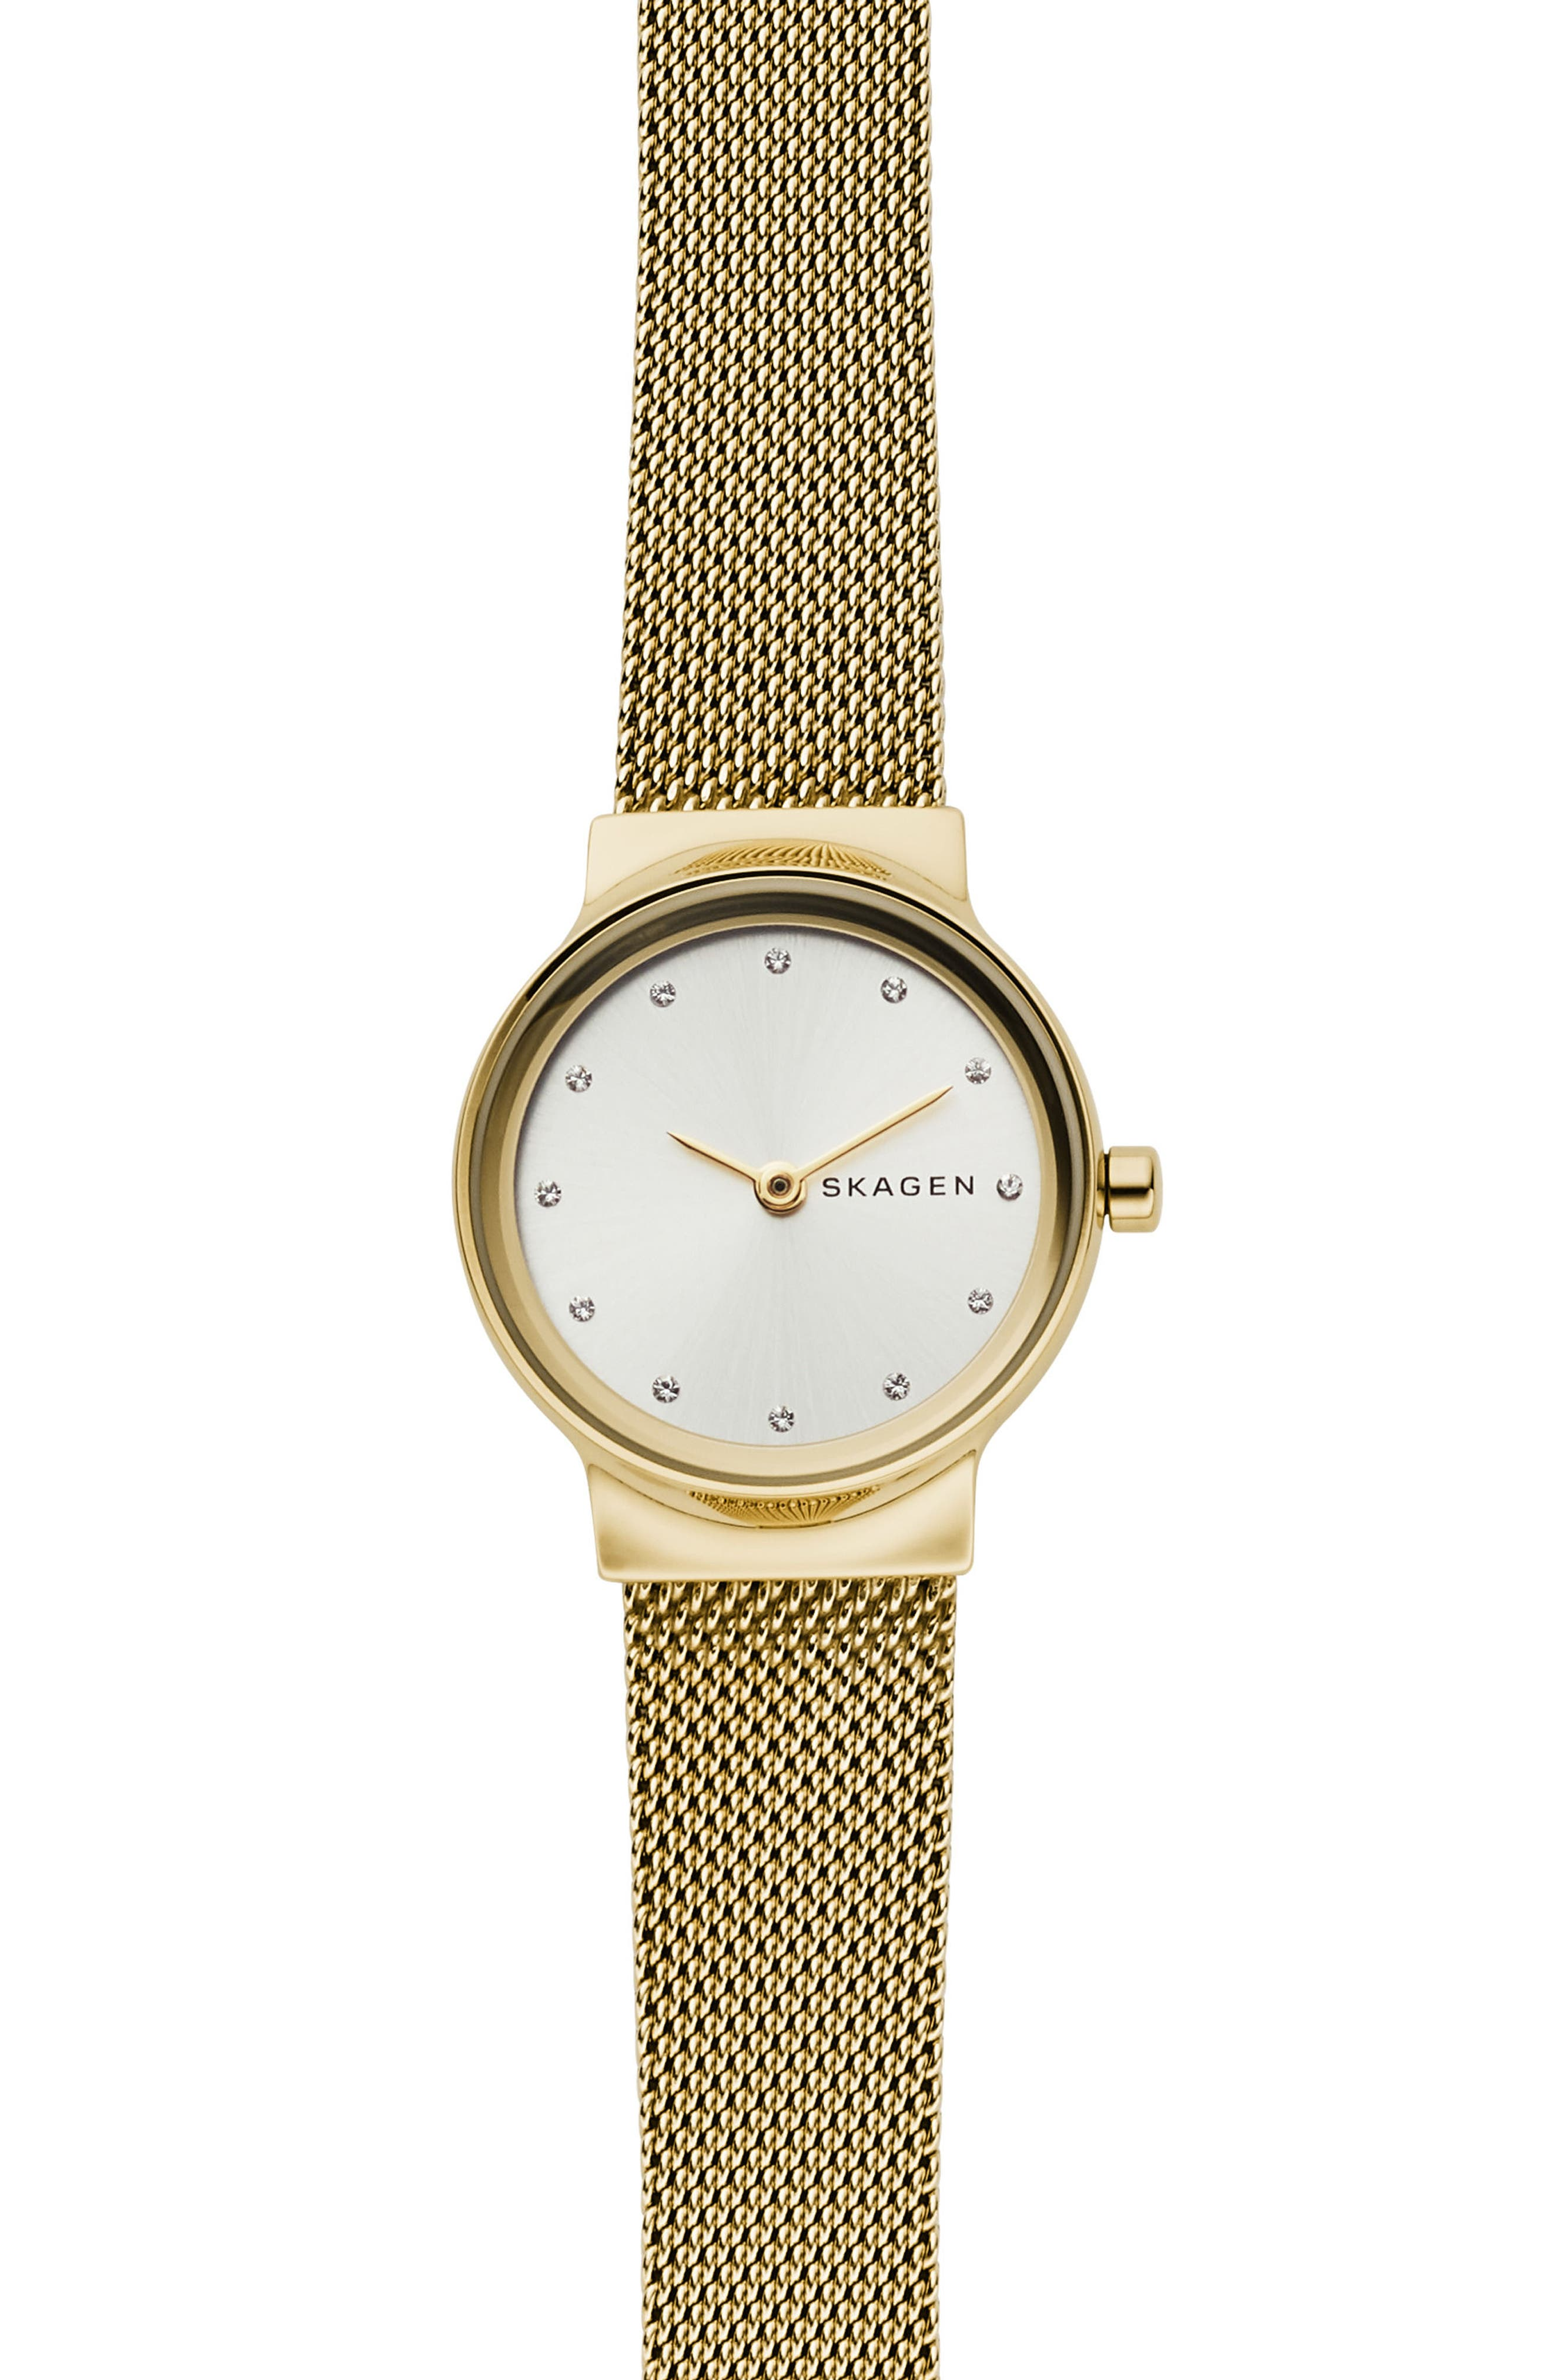 SKAGEN, Freja Bracelet Watch, 26mm, Main thumbnail 1, color, GOLD/ SILVER/ GOLD